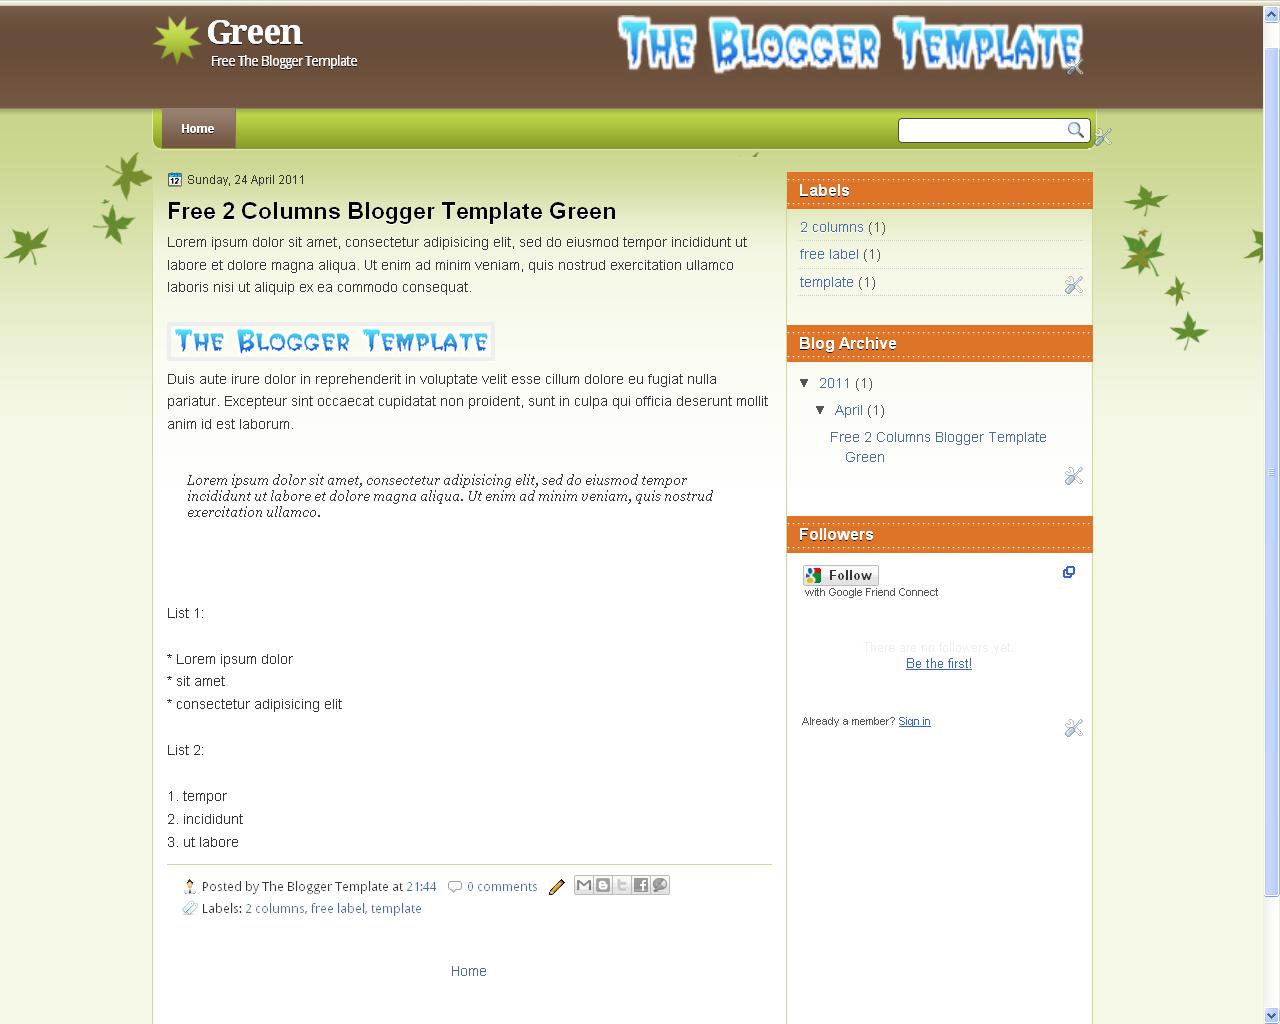 2 Column Bloger Templates The Blogger Template